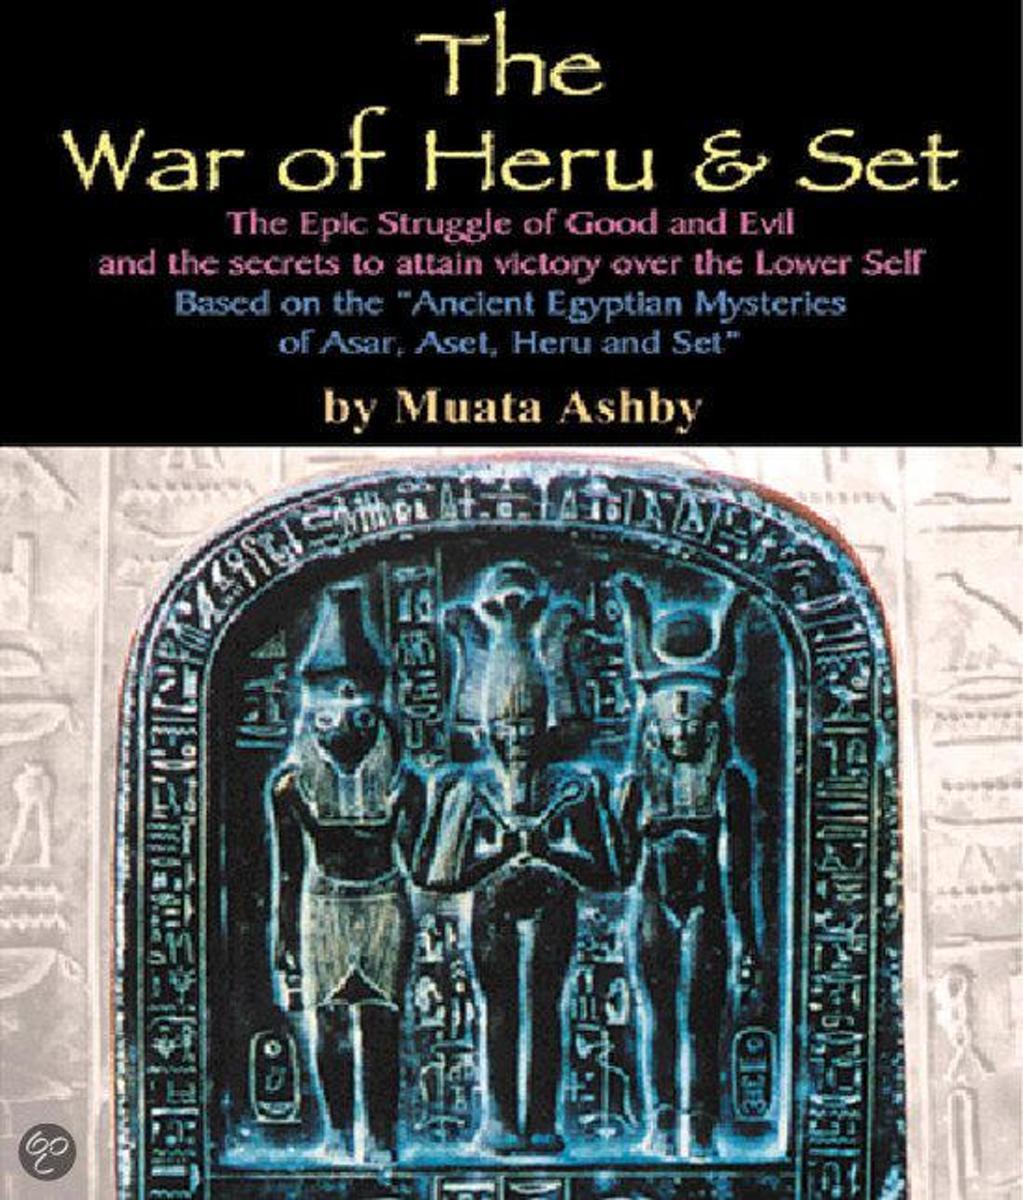 bol com | The War of heru and Set (ebook), Muata Ashby